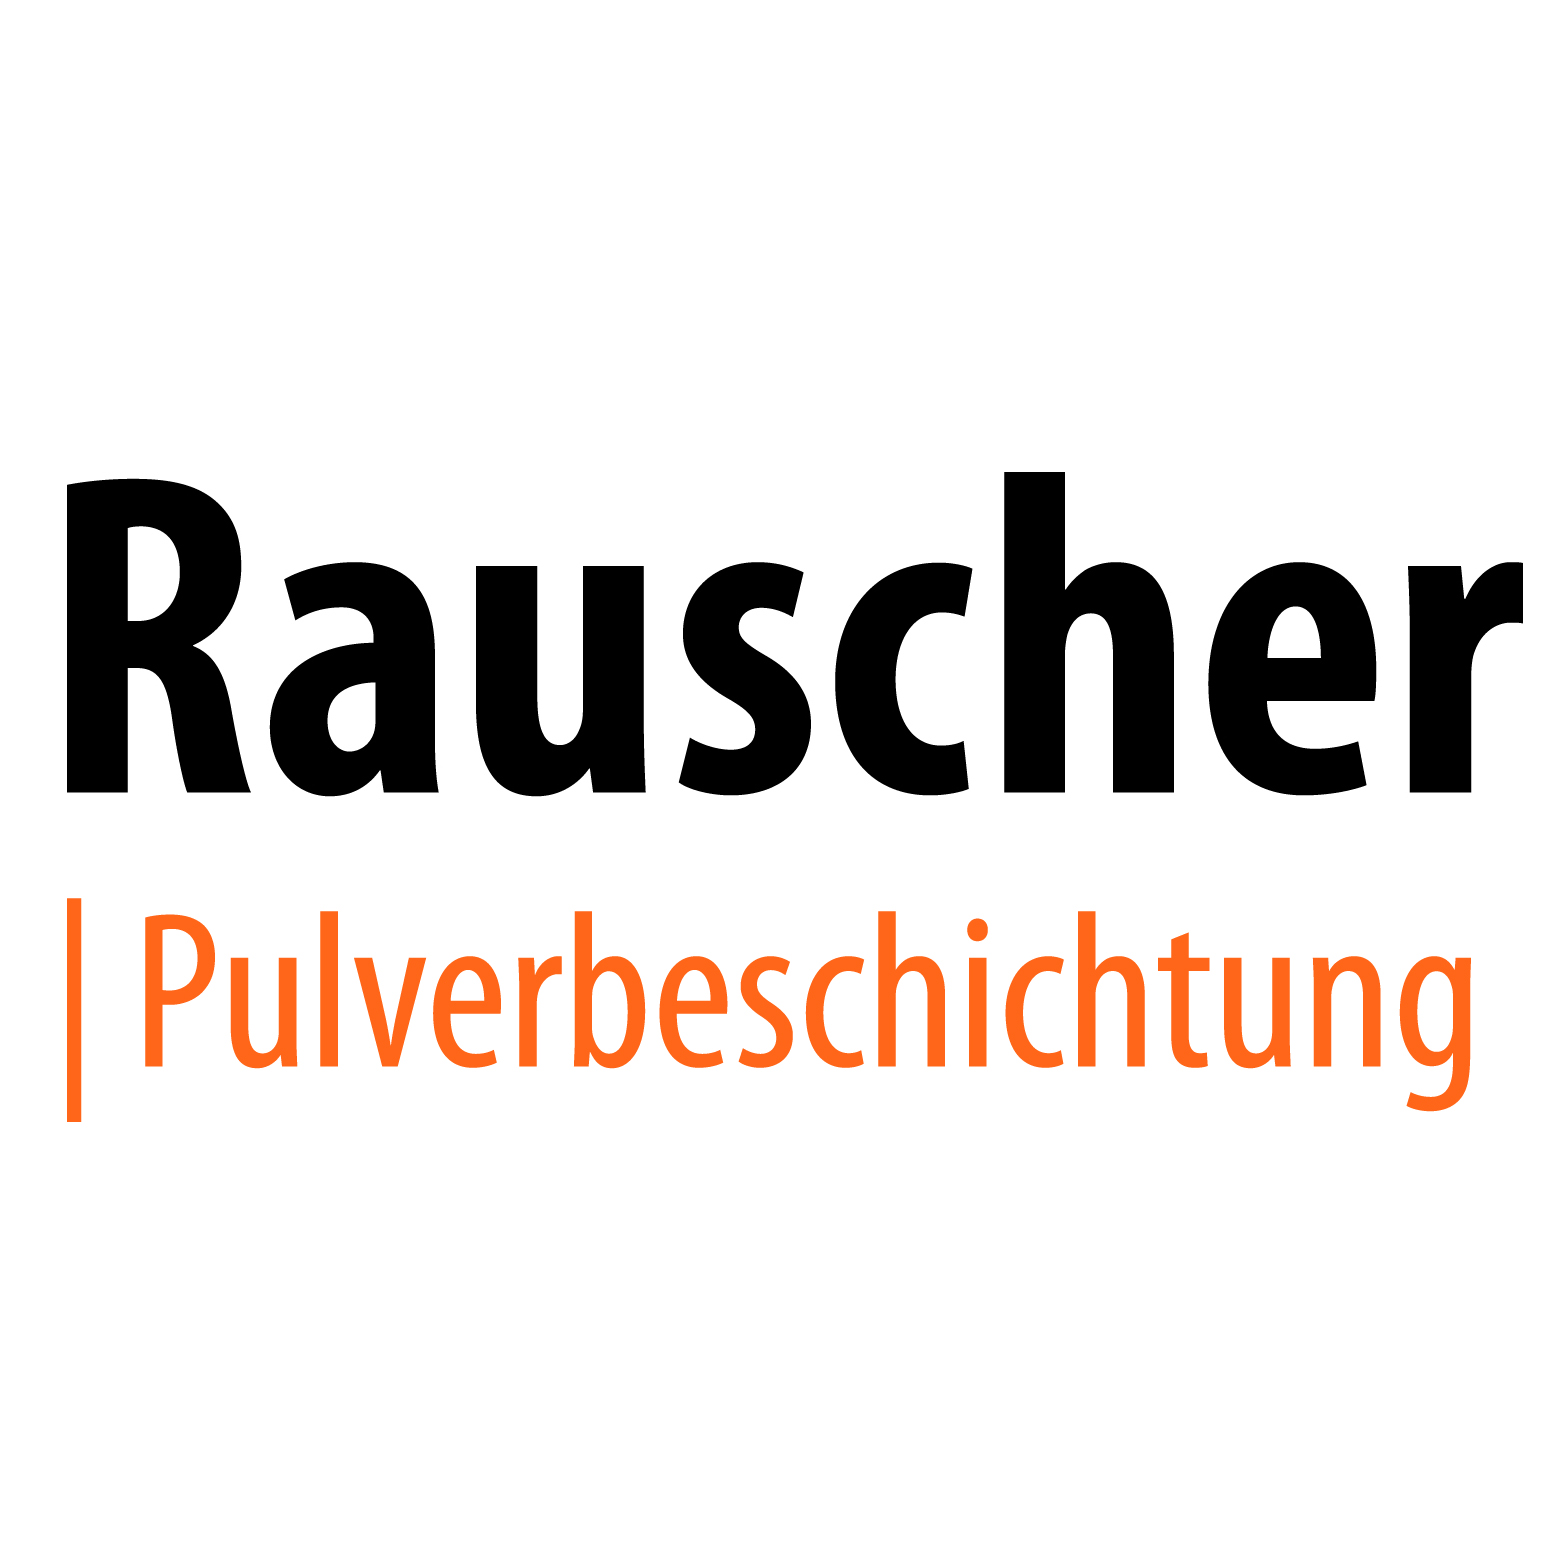 Rauscher_Logo_Pulverbeschichtung